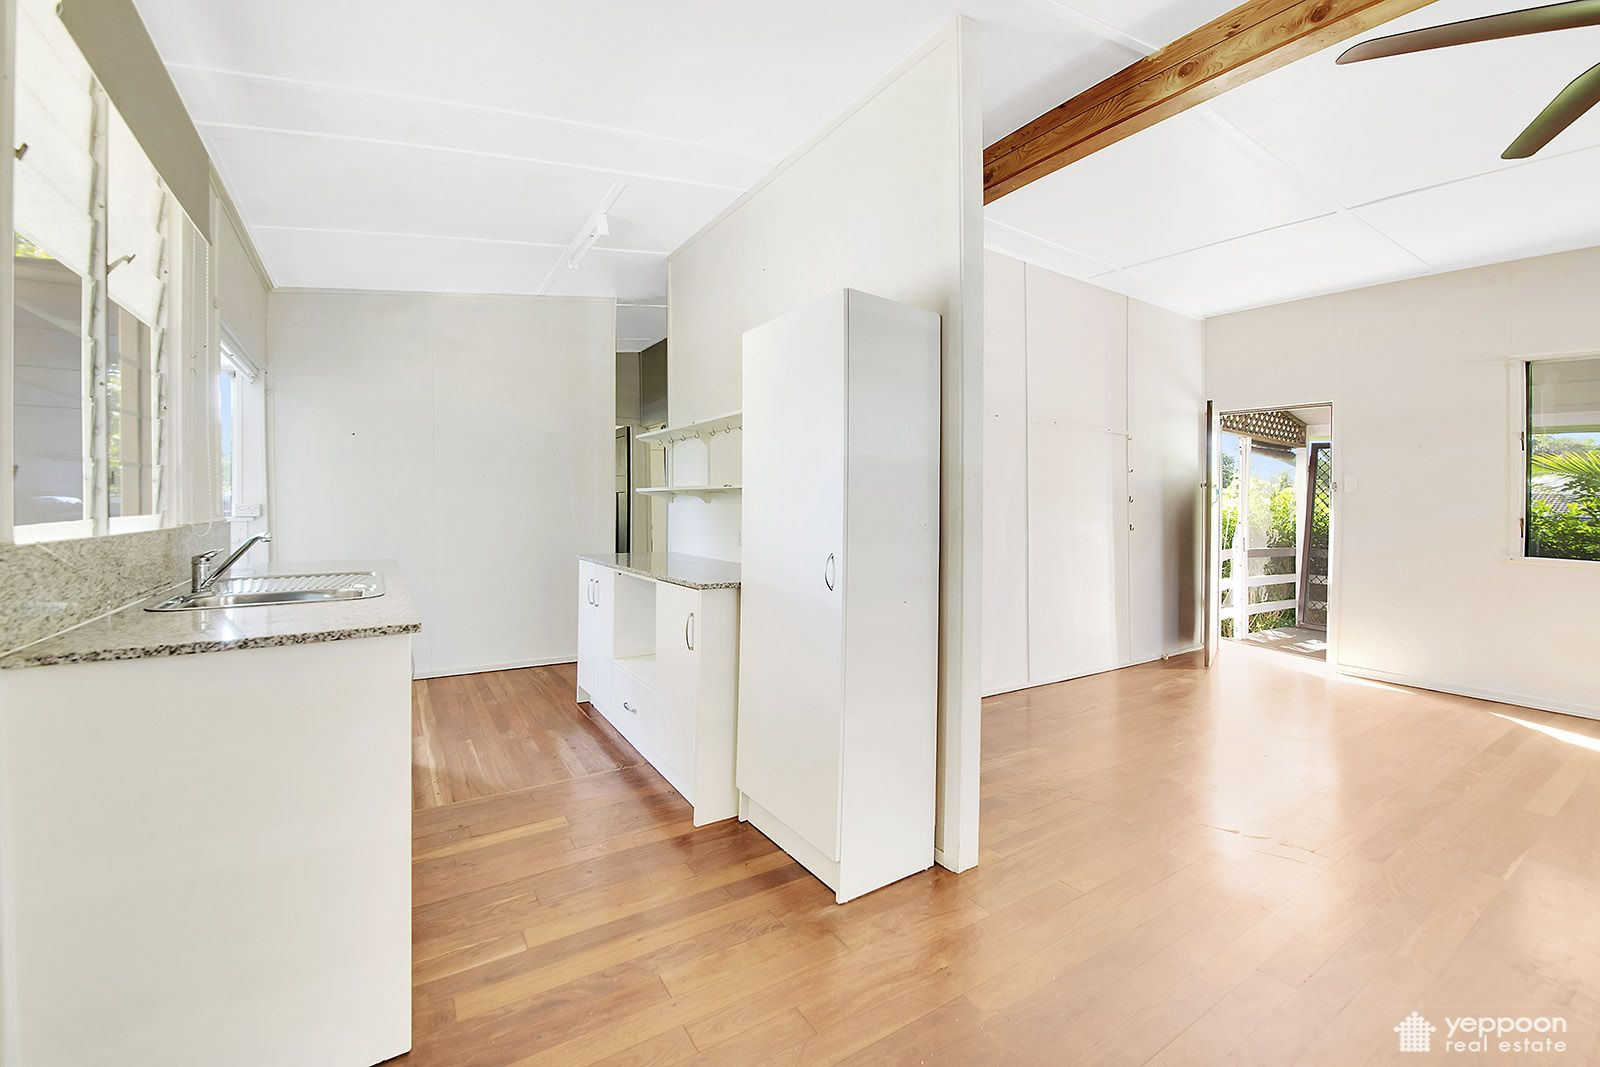 44 William Street, Yeppoon QLD 4703, Image 1